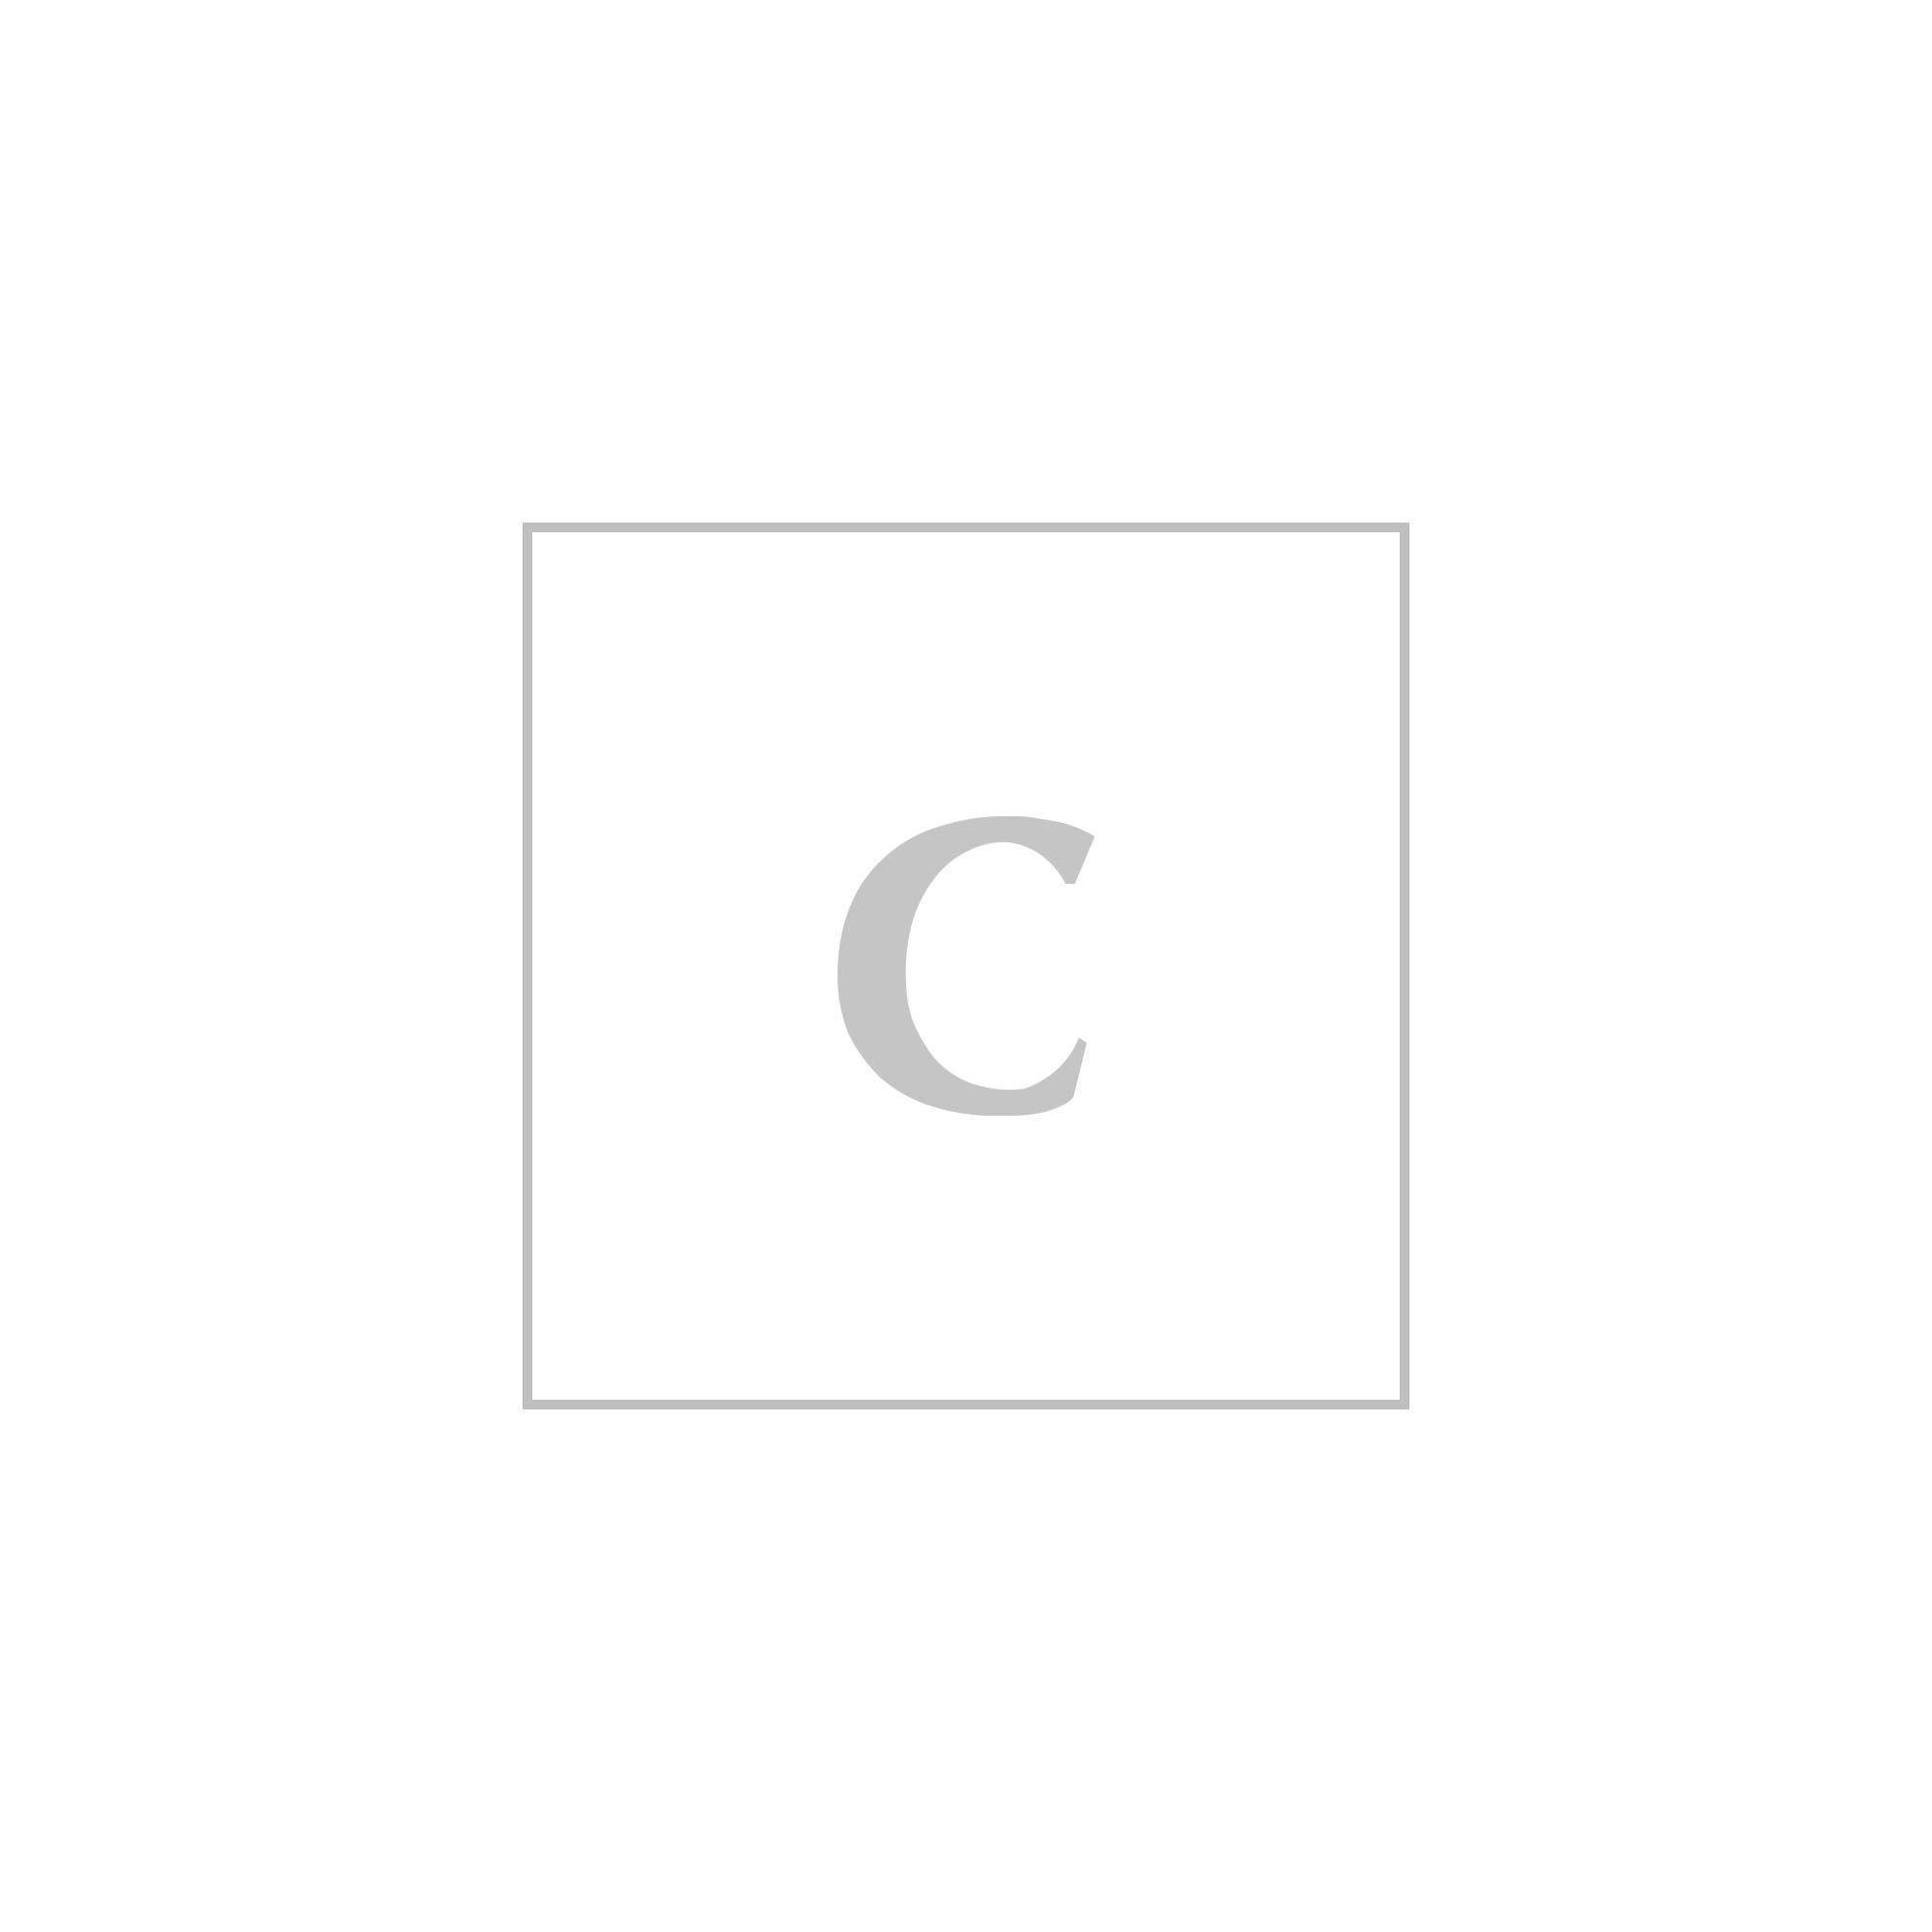 Dolce & gabbana dauphine calfskin wallet